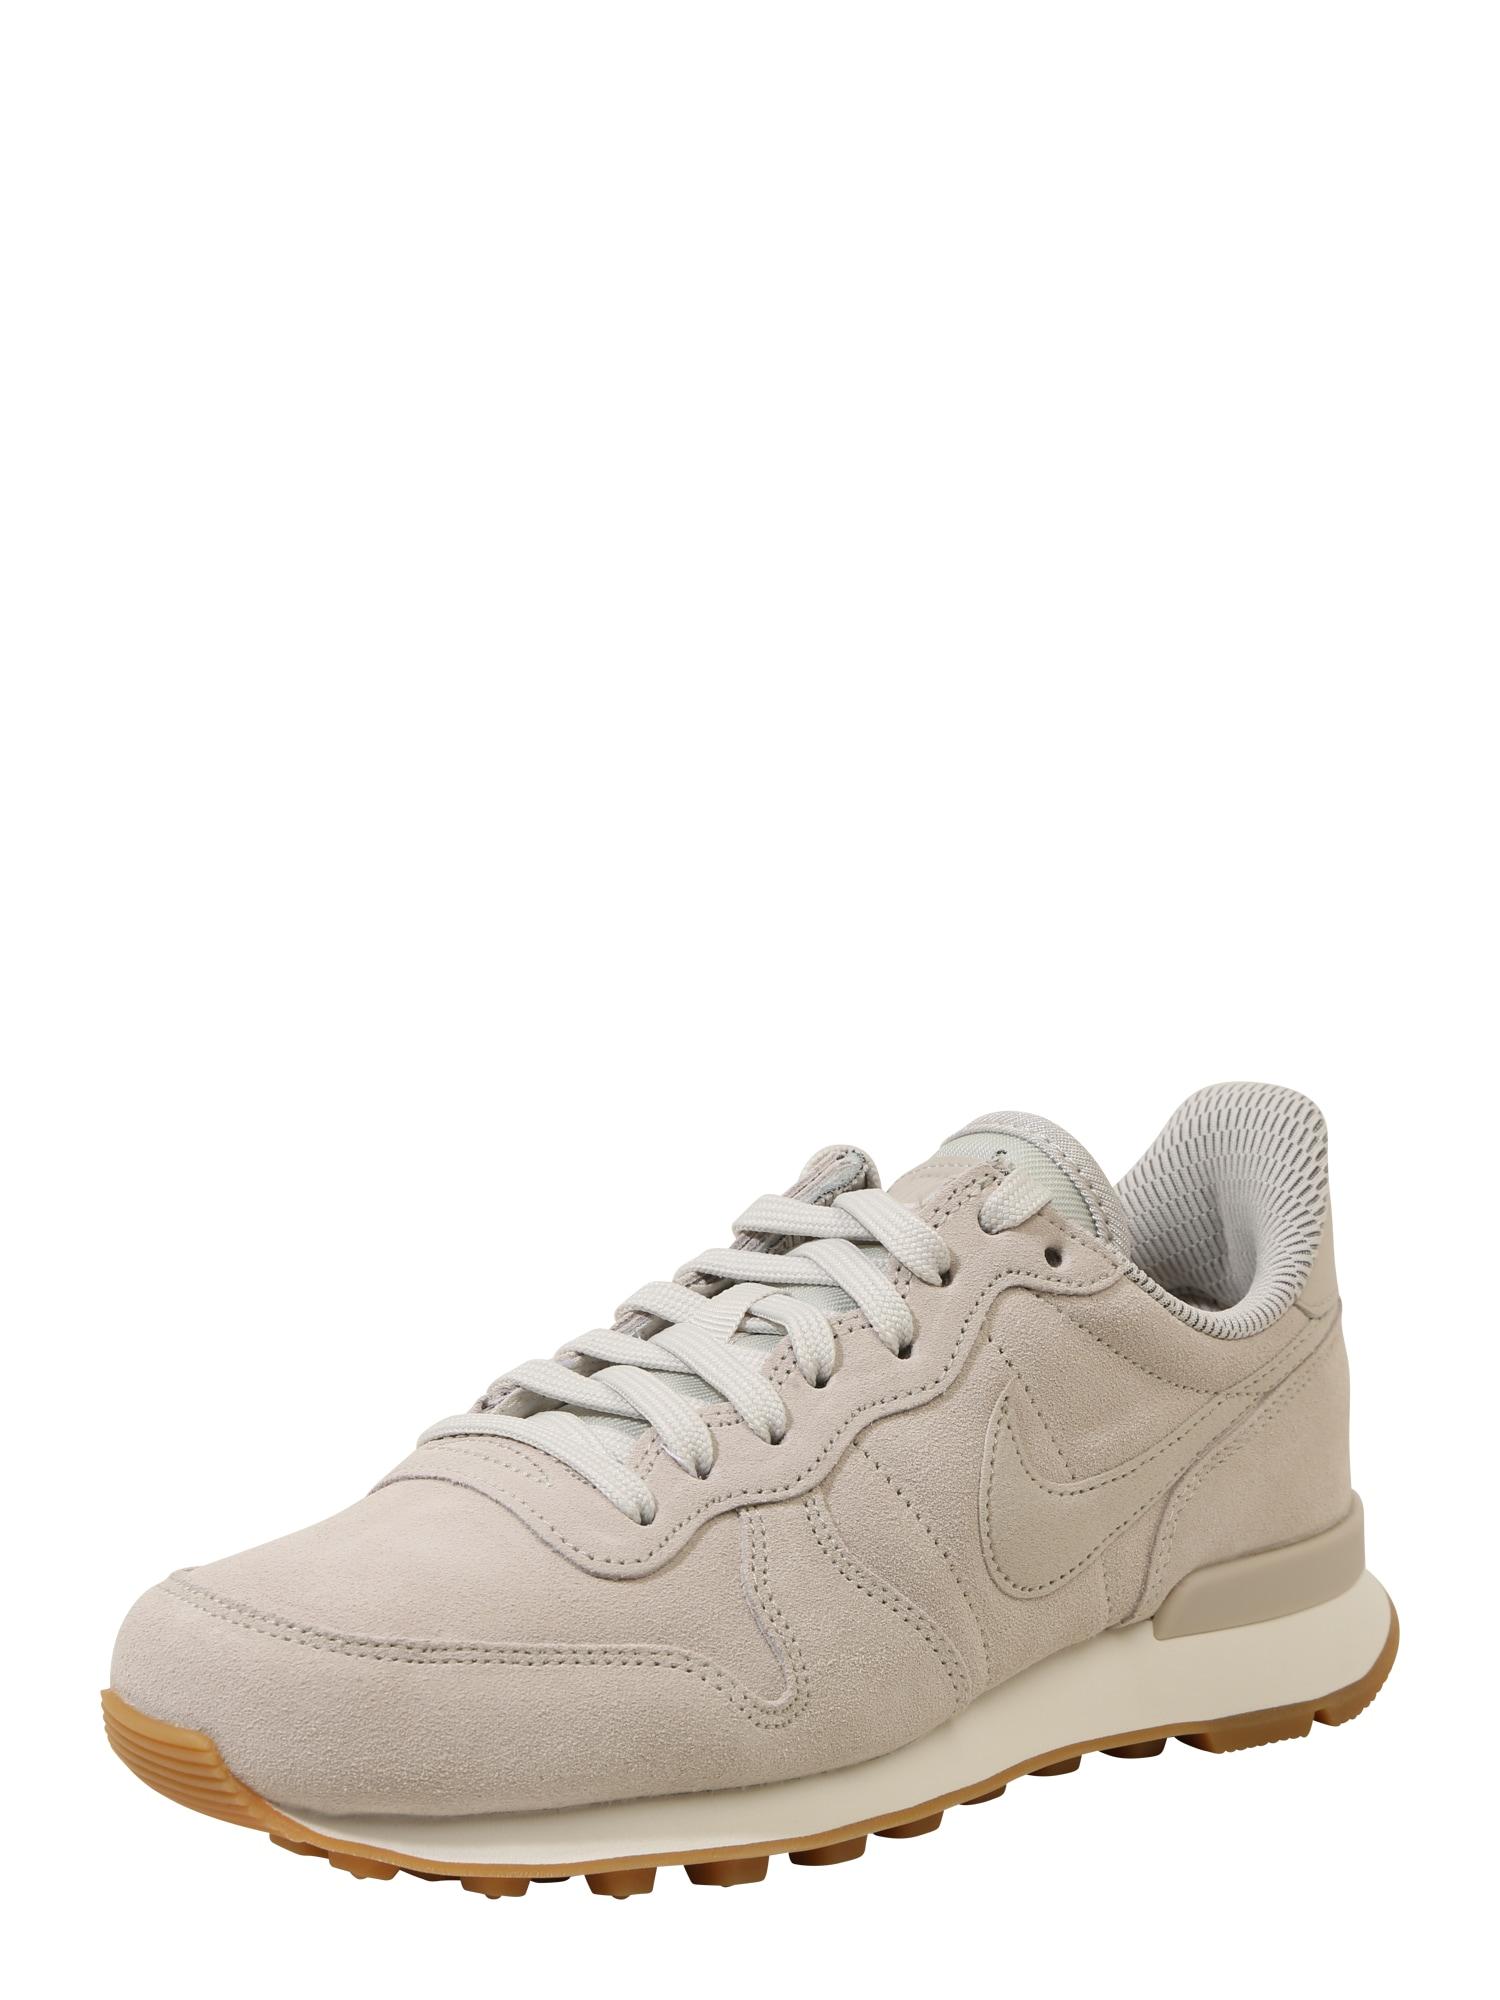 Tenisky Internationalist béžová Nike Sportswear